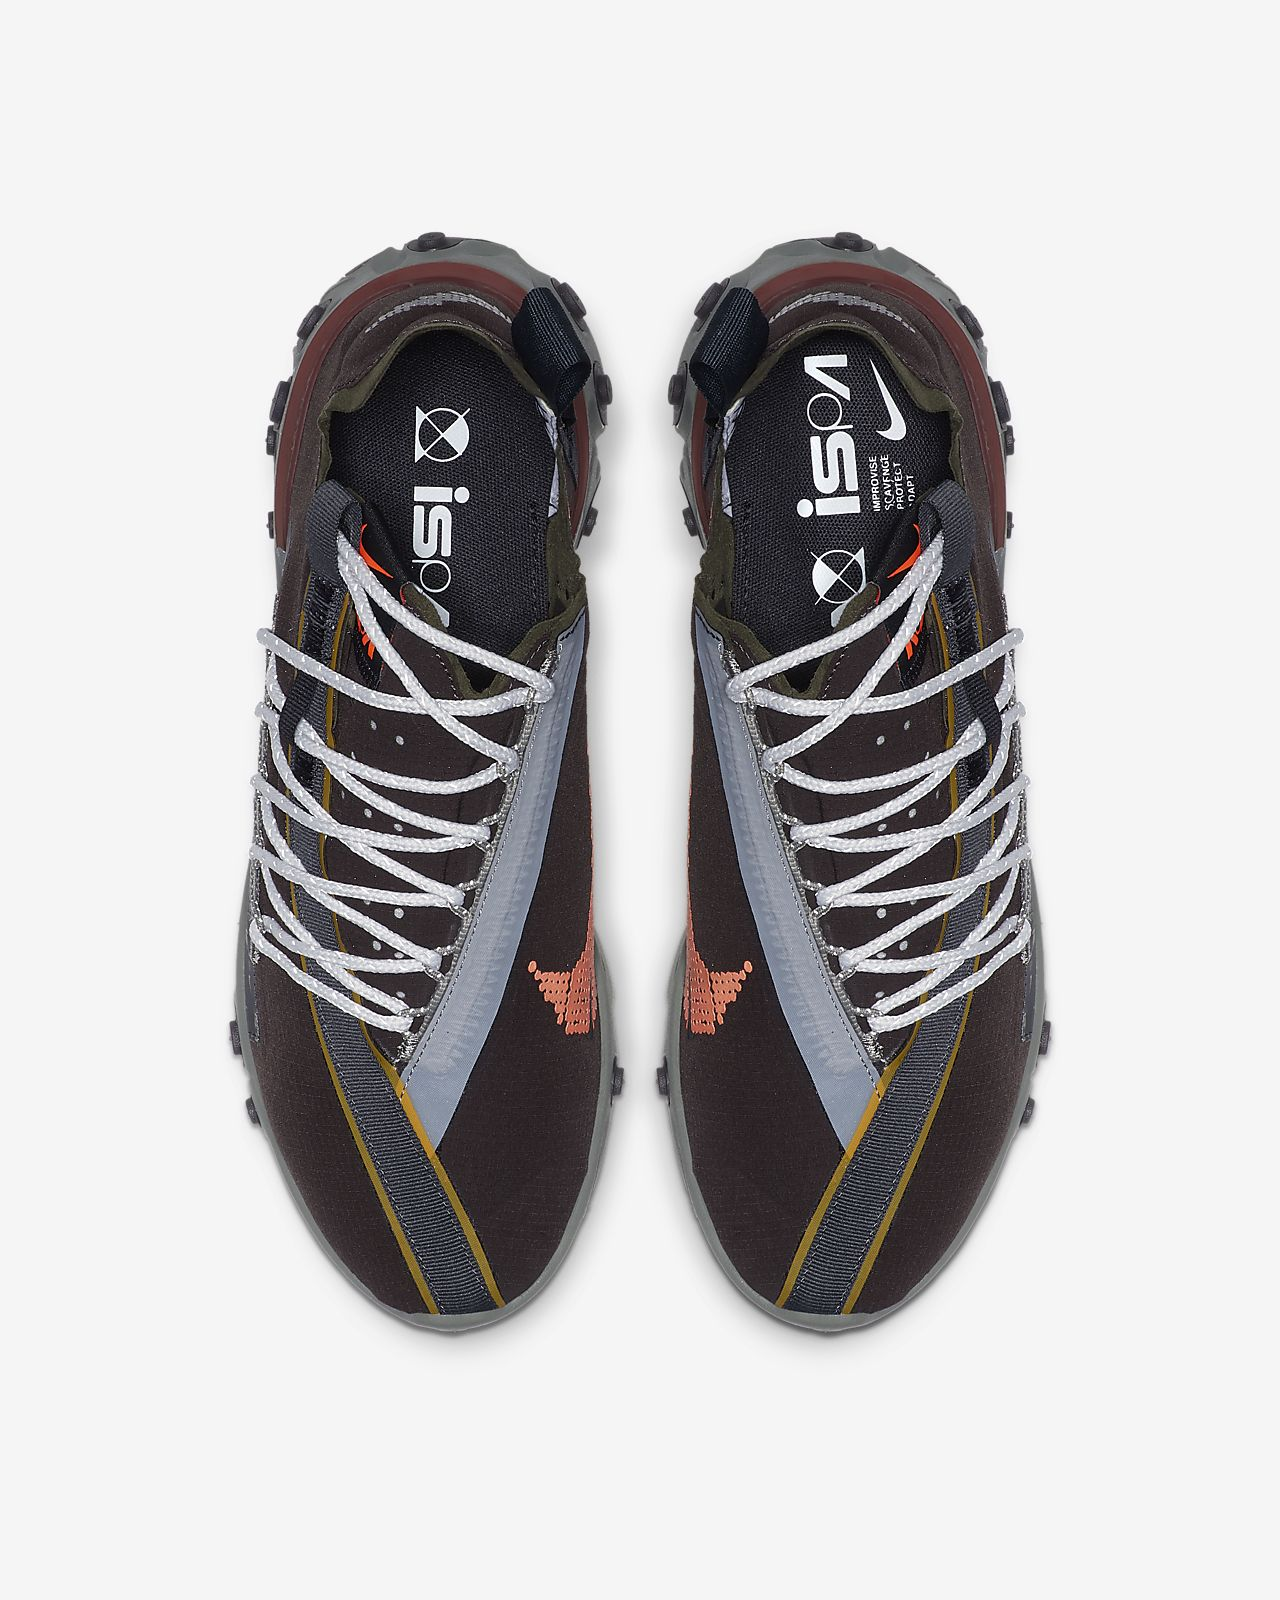 Magnifique Prestige Air chaussure Zoom Basket Nike qMGSVUpz